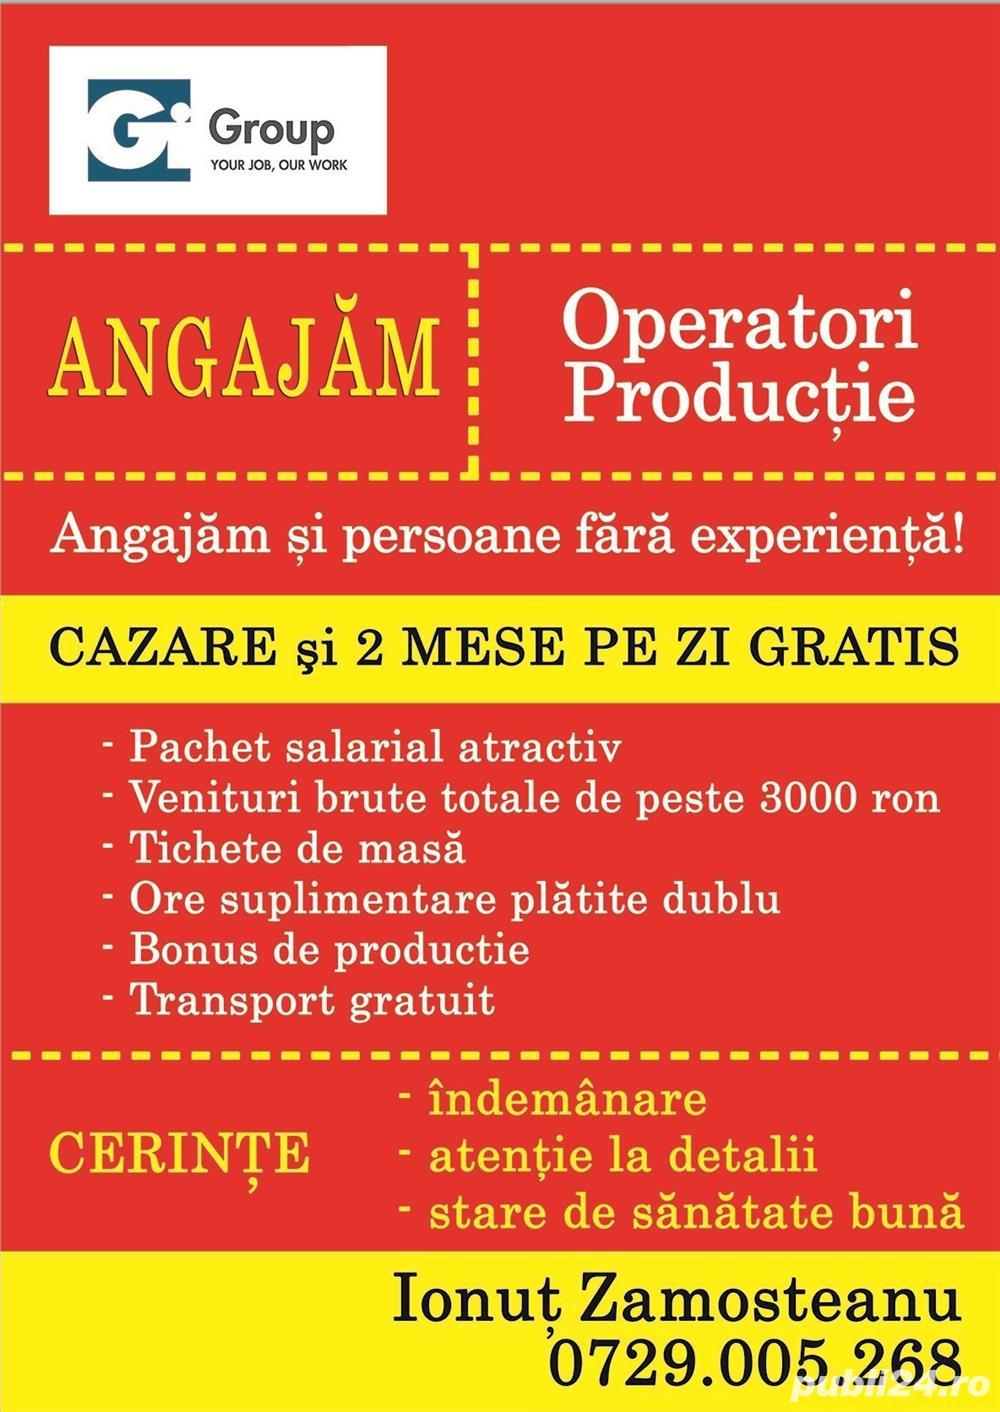 Angajam muncitori necalificați in Timisoara cu cazare si masa oferite gratuit id 70